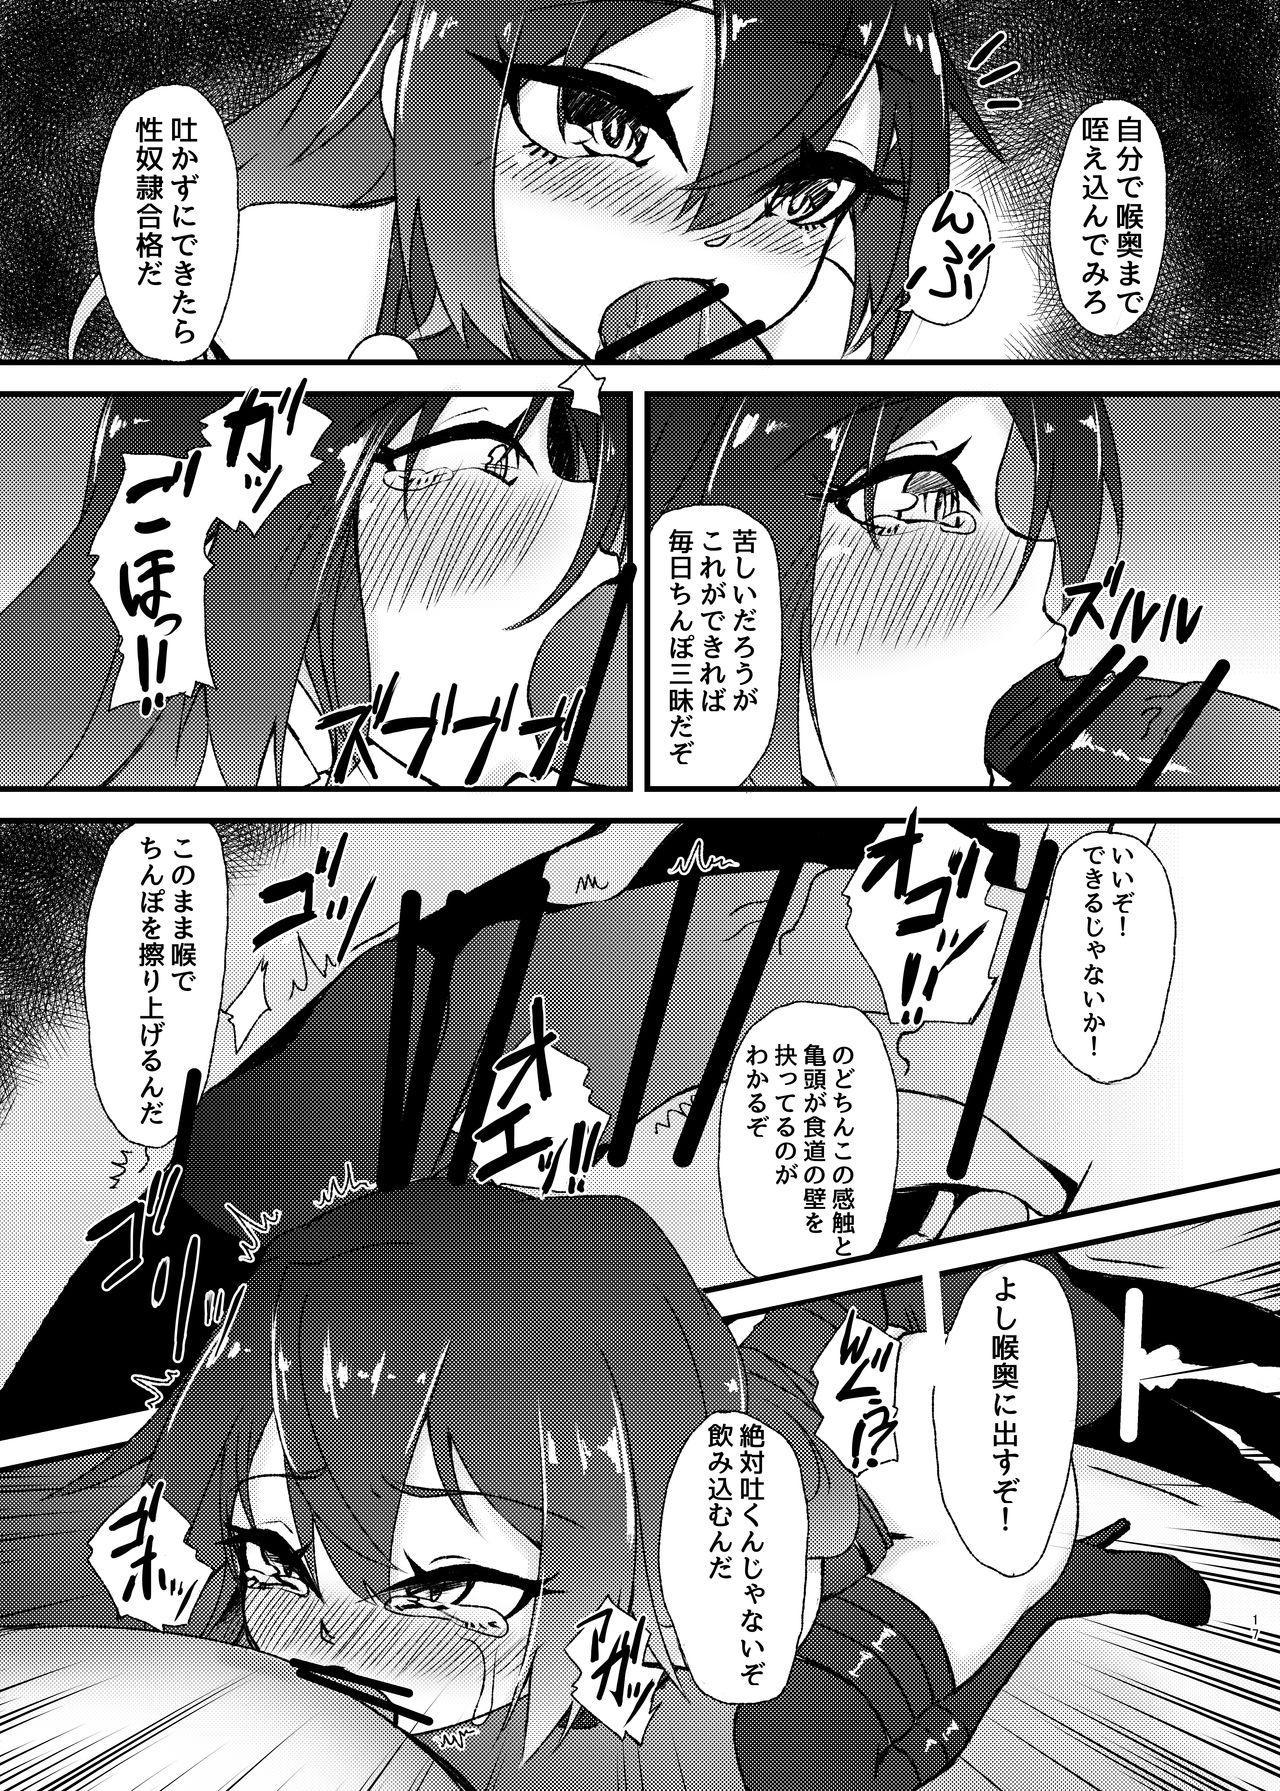 Mizugi no Satsuei datte Itta jan 16